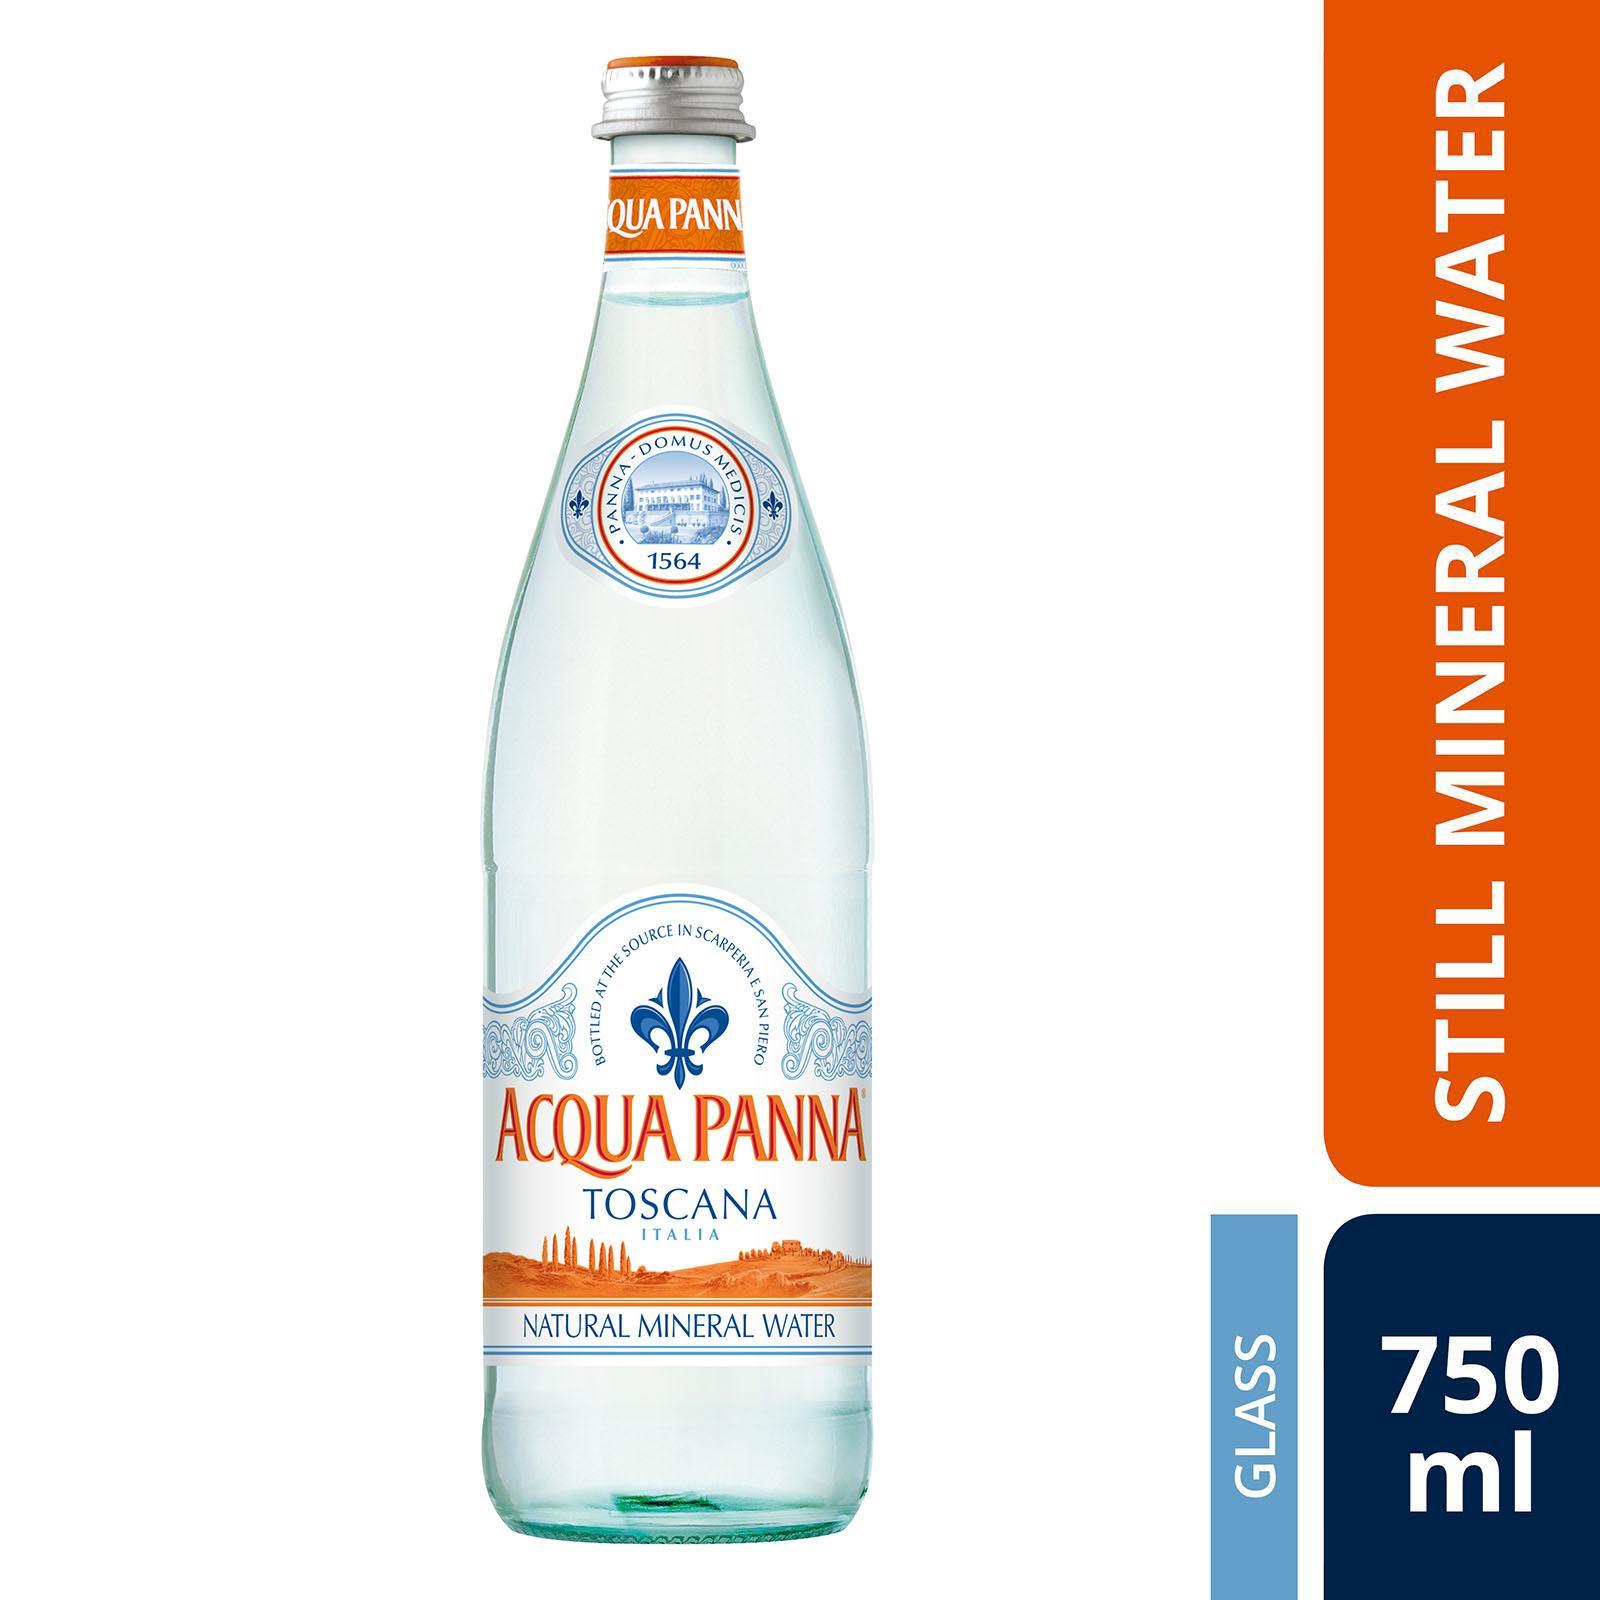 8a11f09088 Acqua Panna Natural Mineral Water | Lazada Singapore